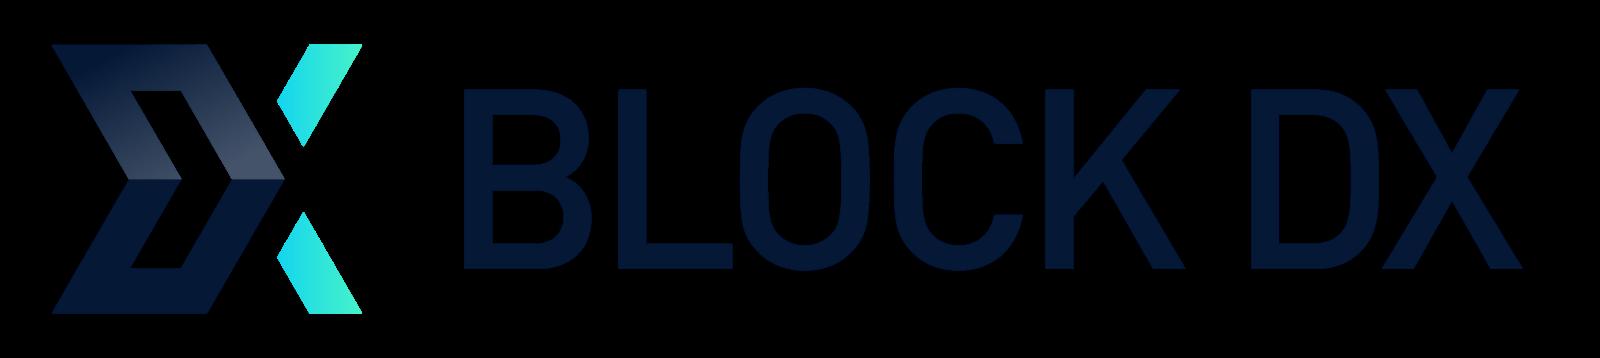 Blocknet